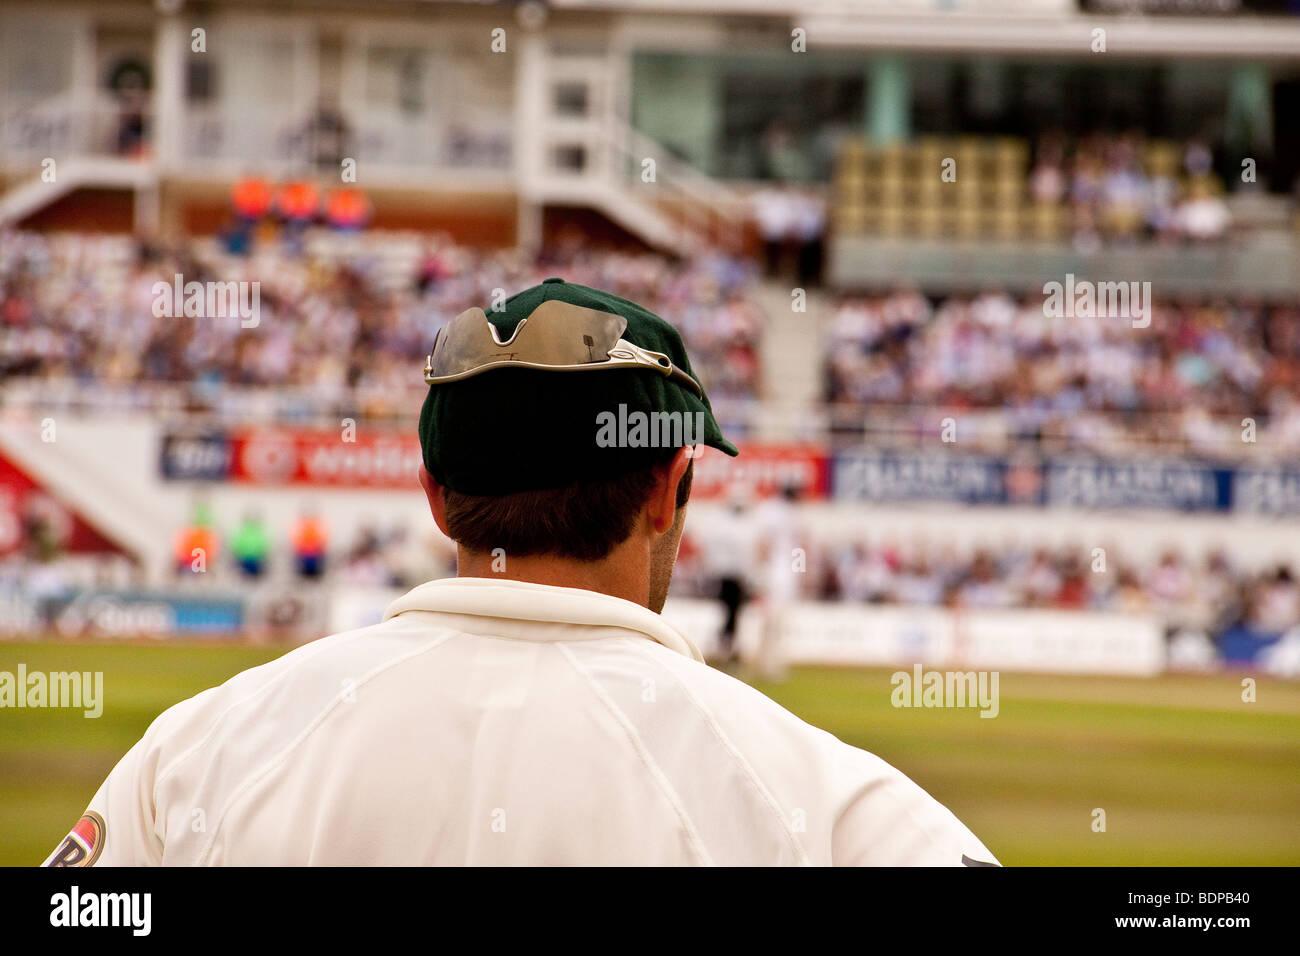 0adadff8438a Cricket Sunglasses Stock Photos   Cricket Sunglasses Stock Images ...